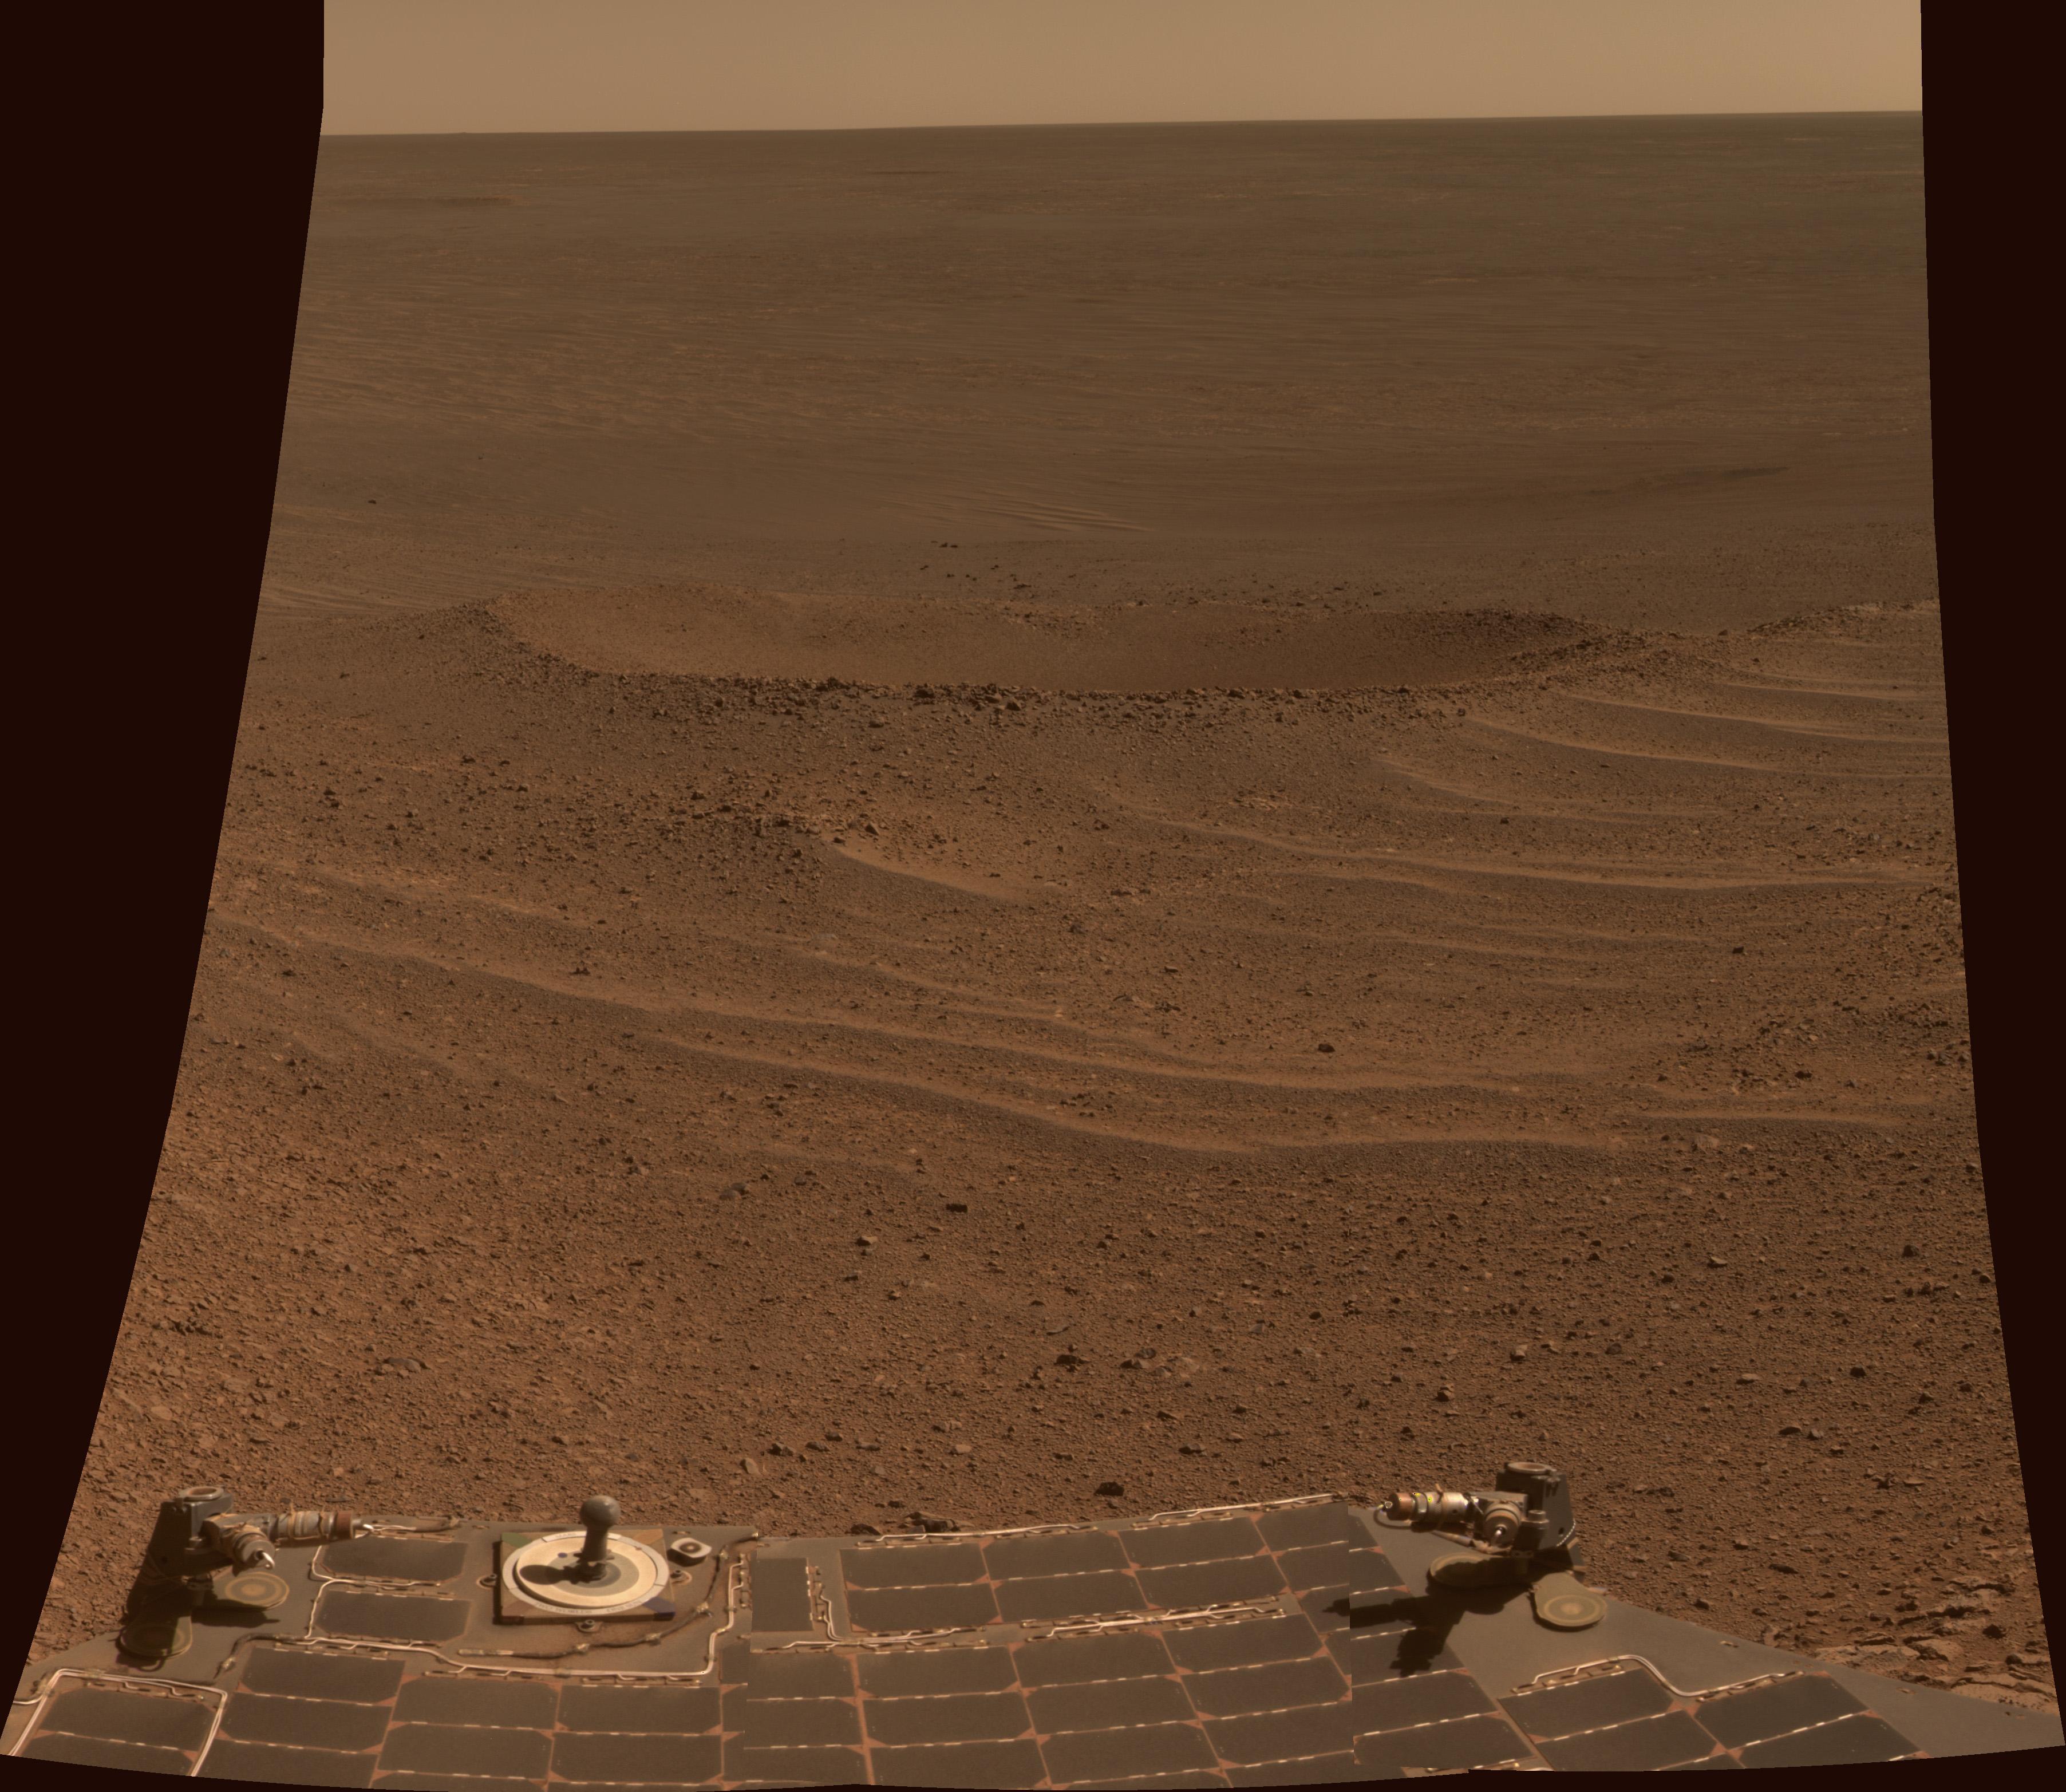 nasa lies about mars - photo #35